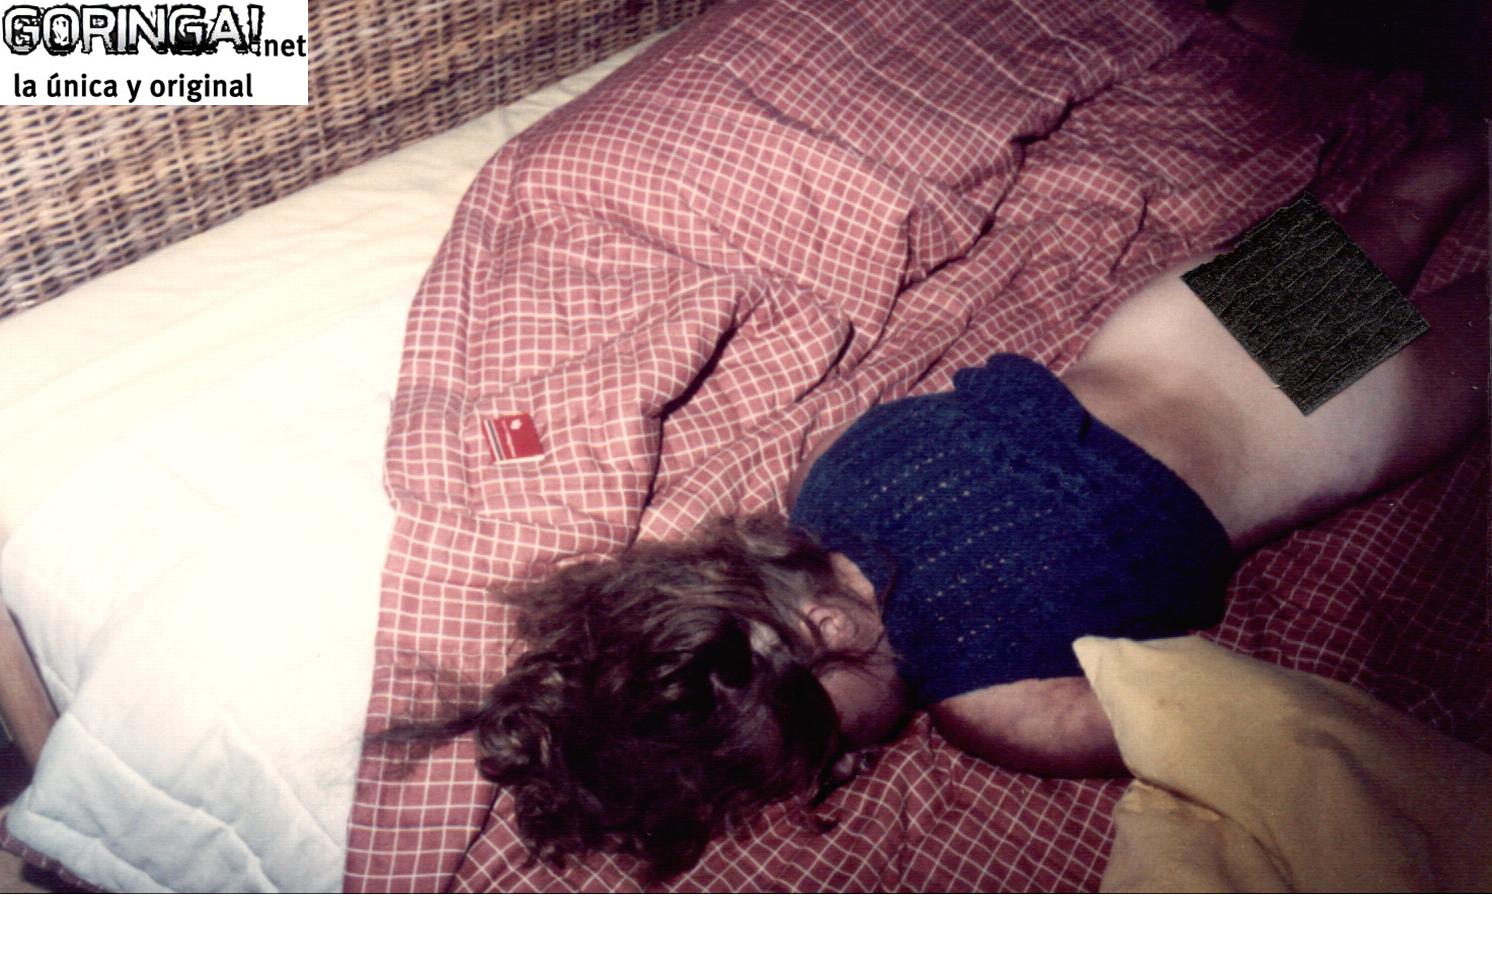 фотографии жестоко насилуют два мужика бабу во все щели